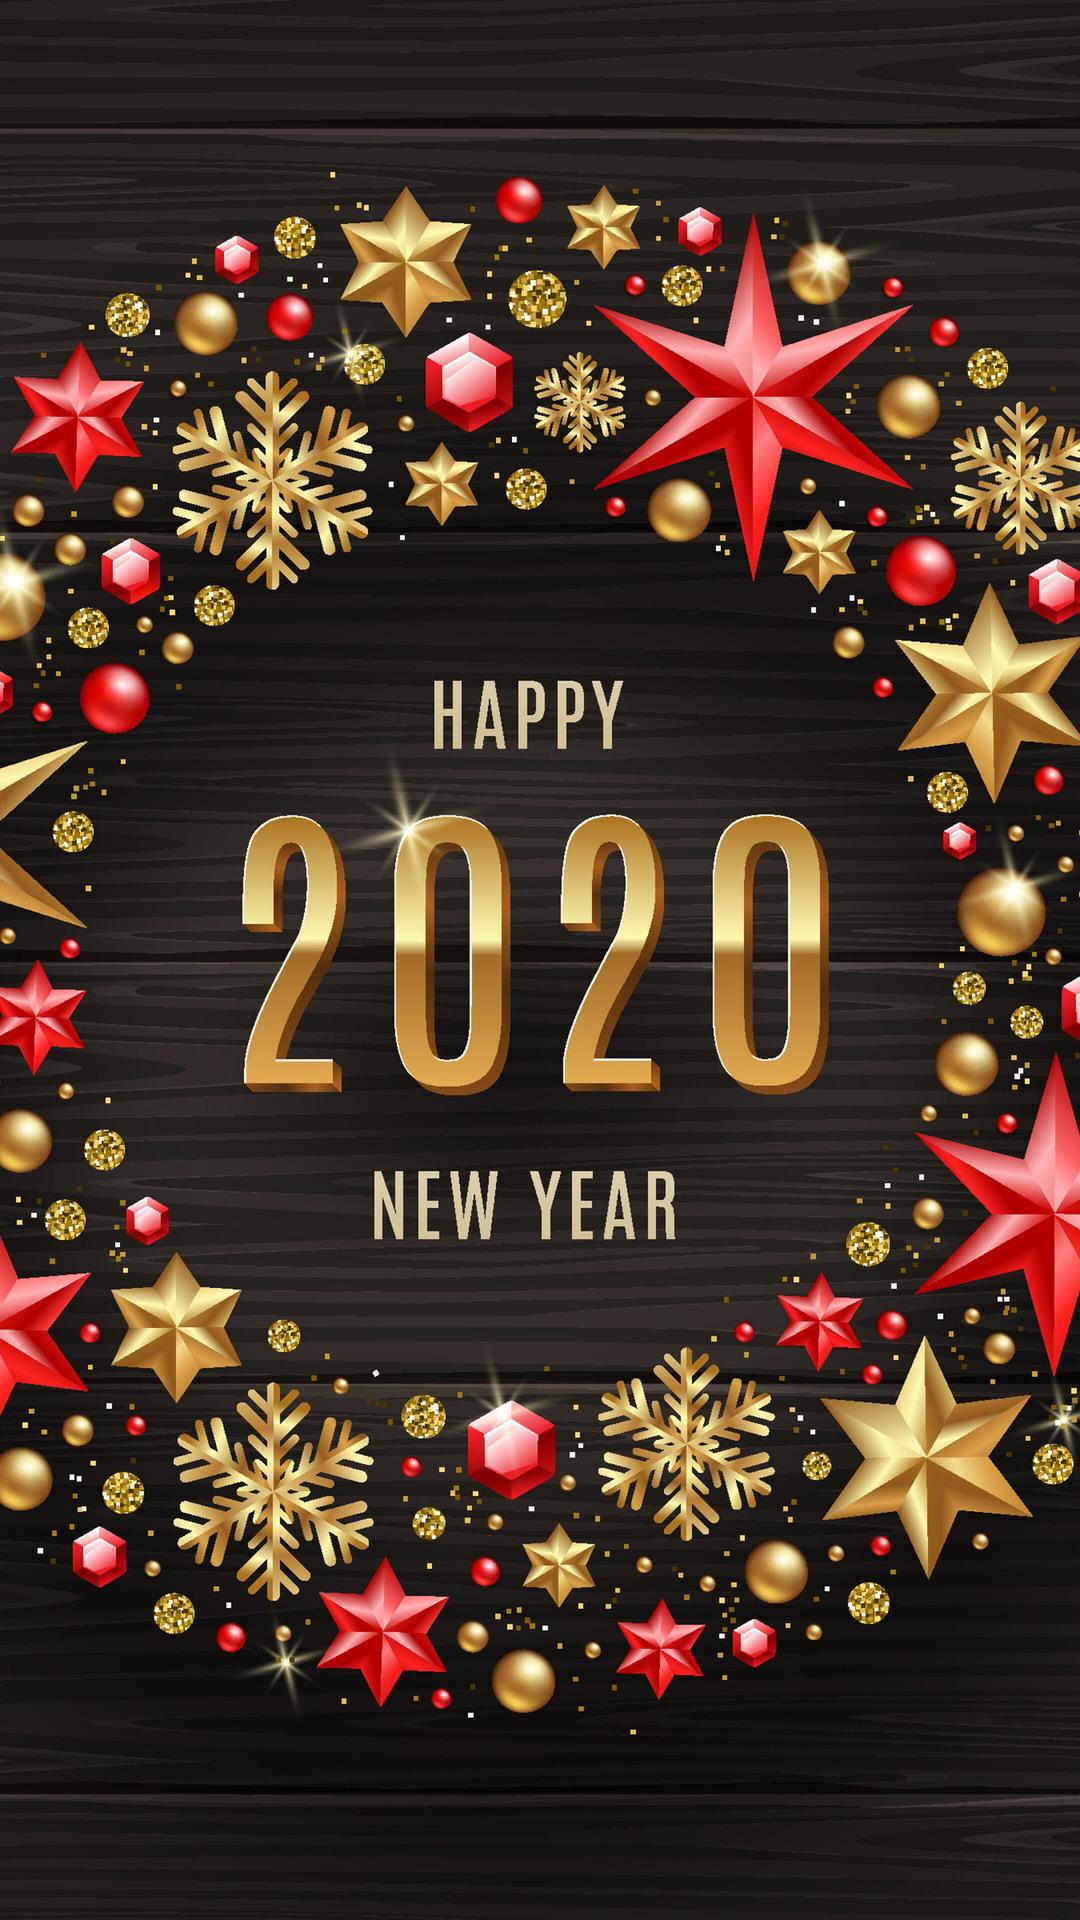 Happy 2020 New Year 4K Wallpaper 42307 1080x1920